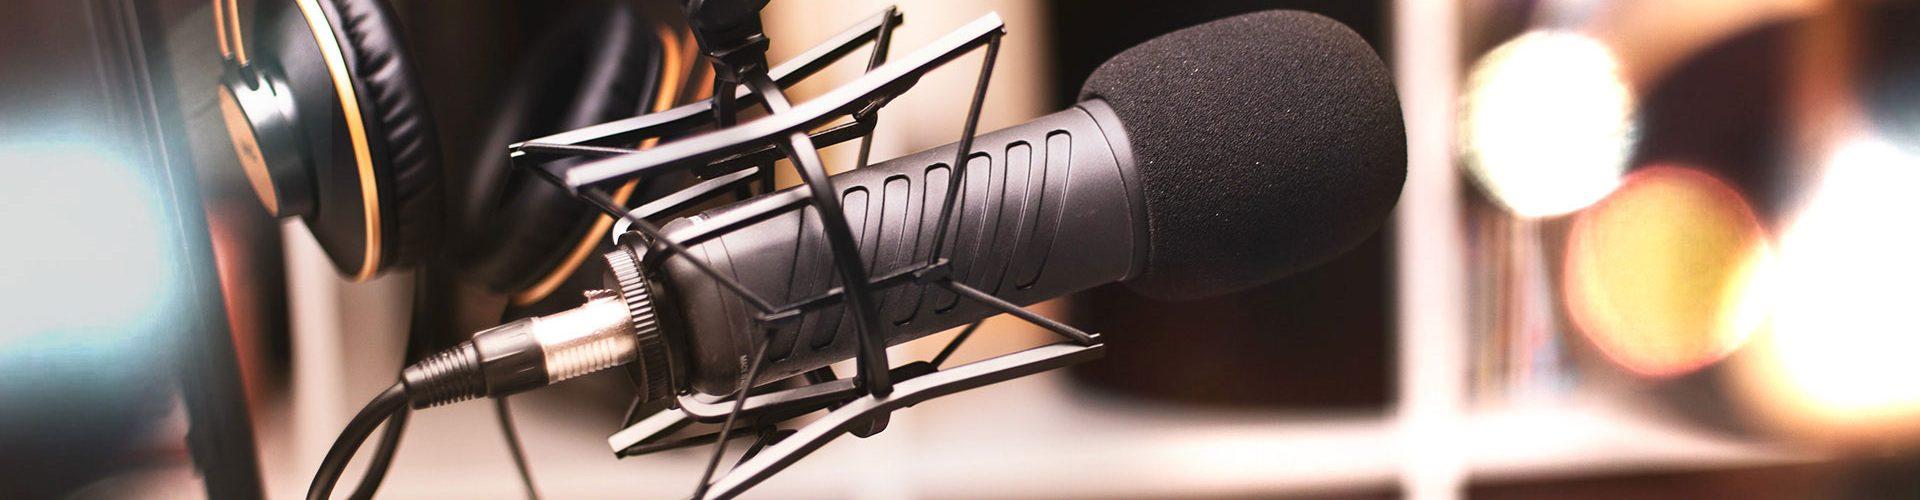 Radiocom Home